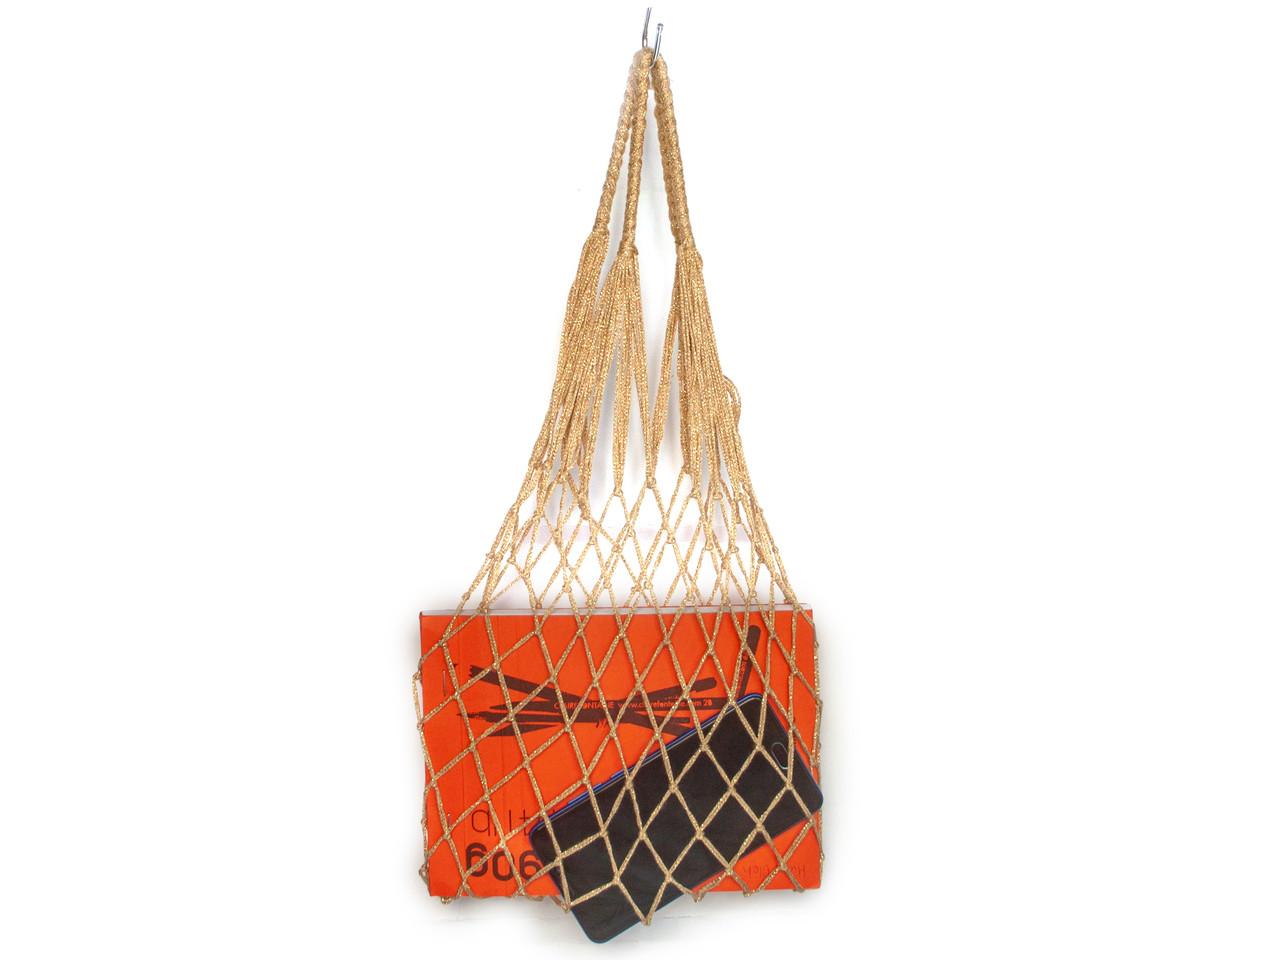 Мини сумка - Сумка для вечеринок - Авоська - Золото - Подарочная сумка